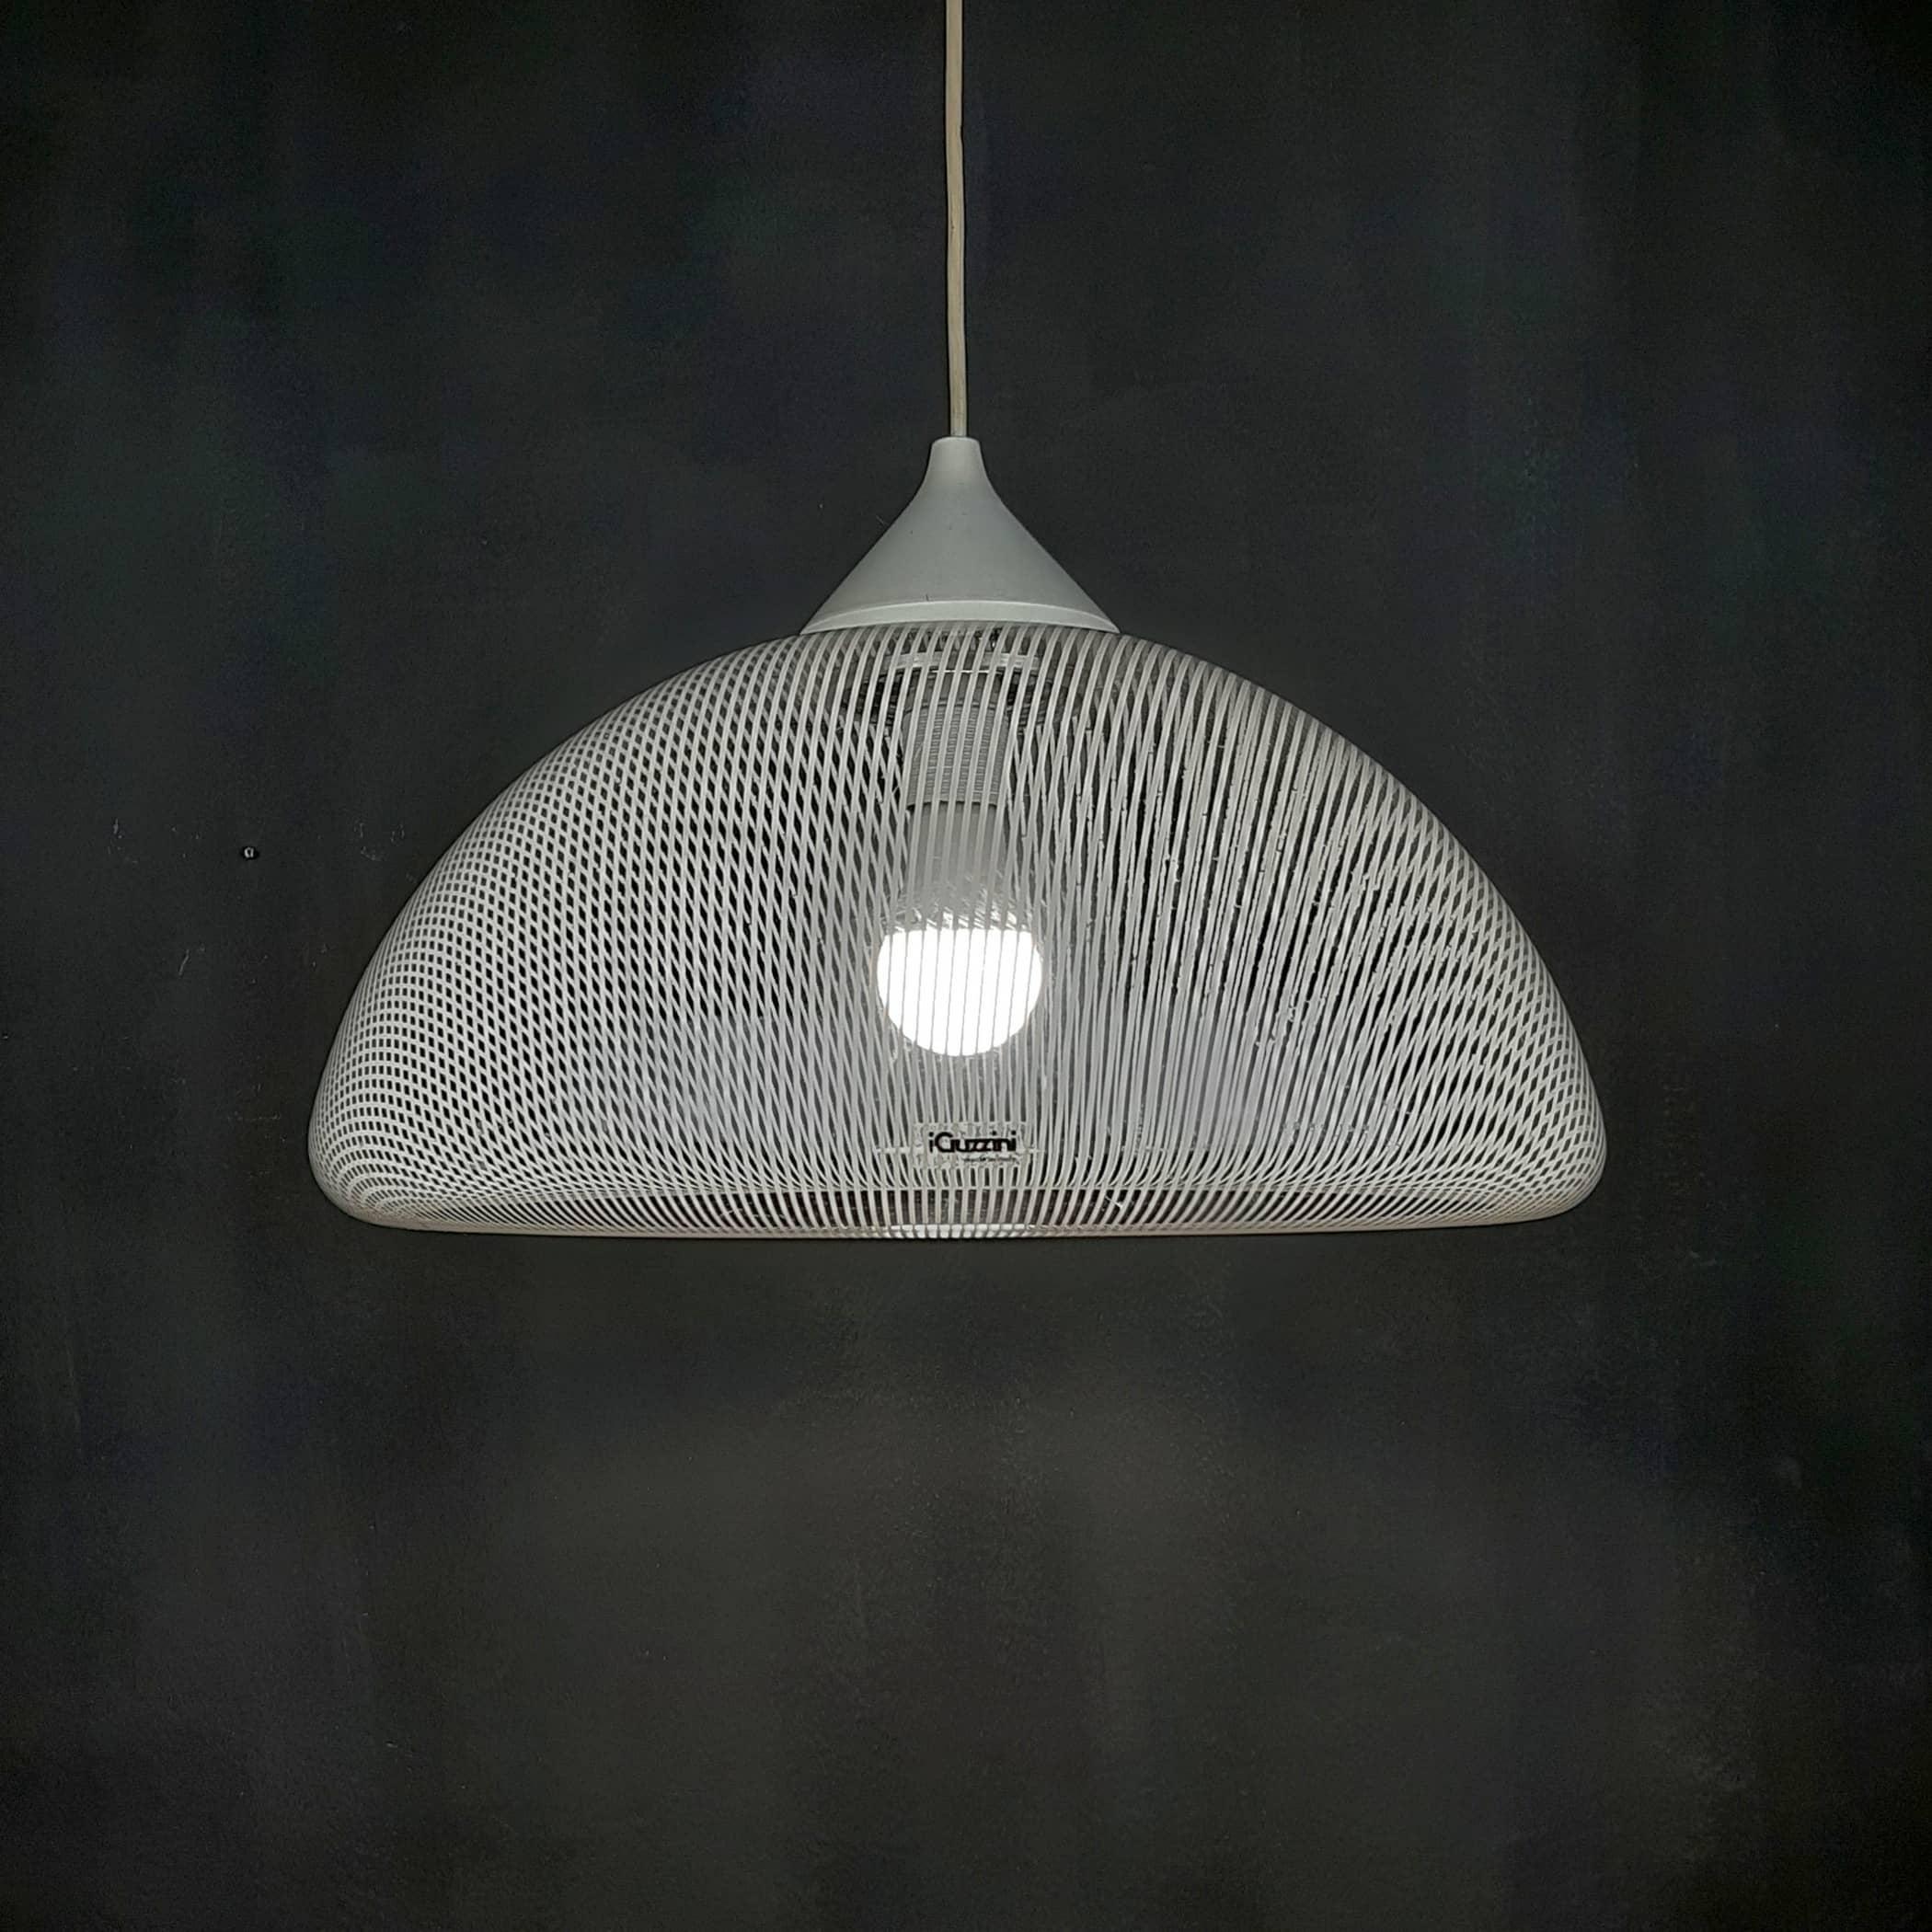 Retro pendant lamp iGuzzini Italy 1980s